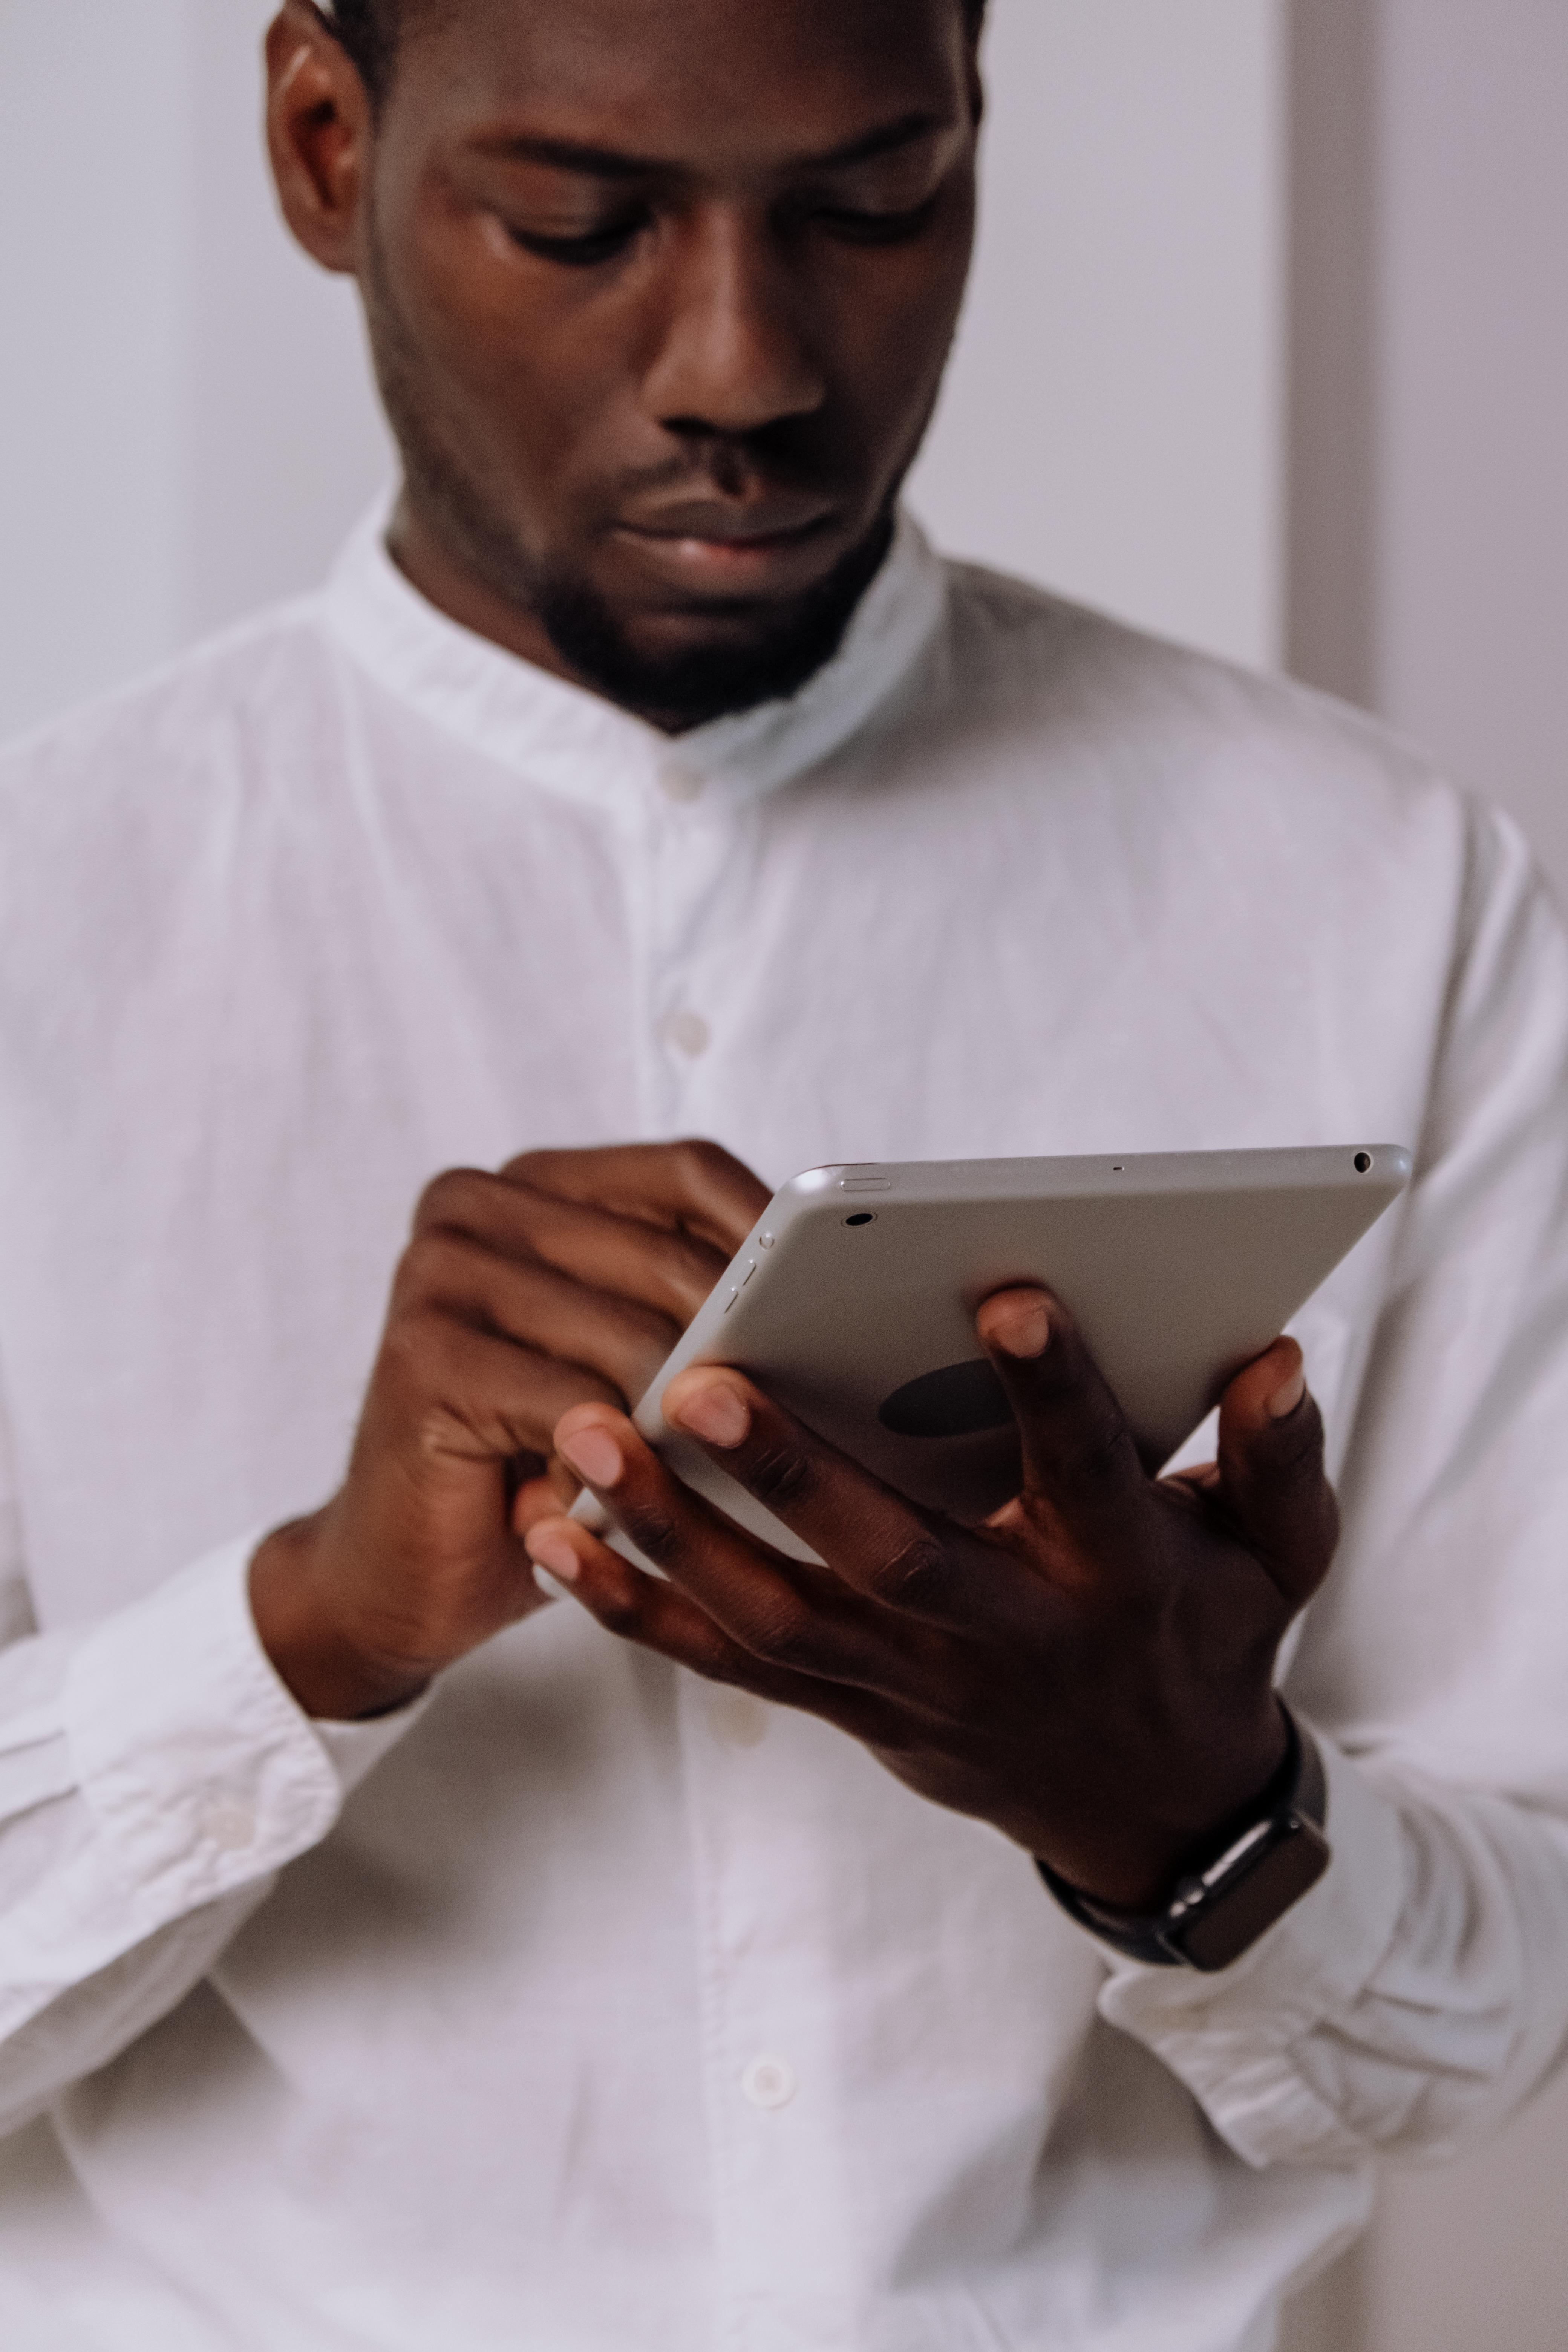 man in white dress shirt holding silver ipad